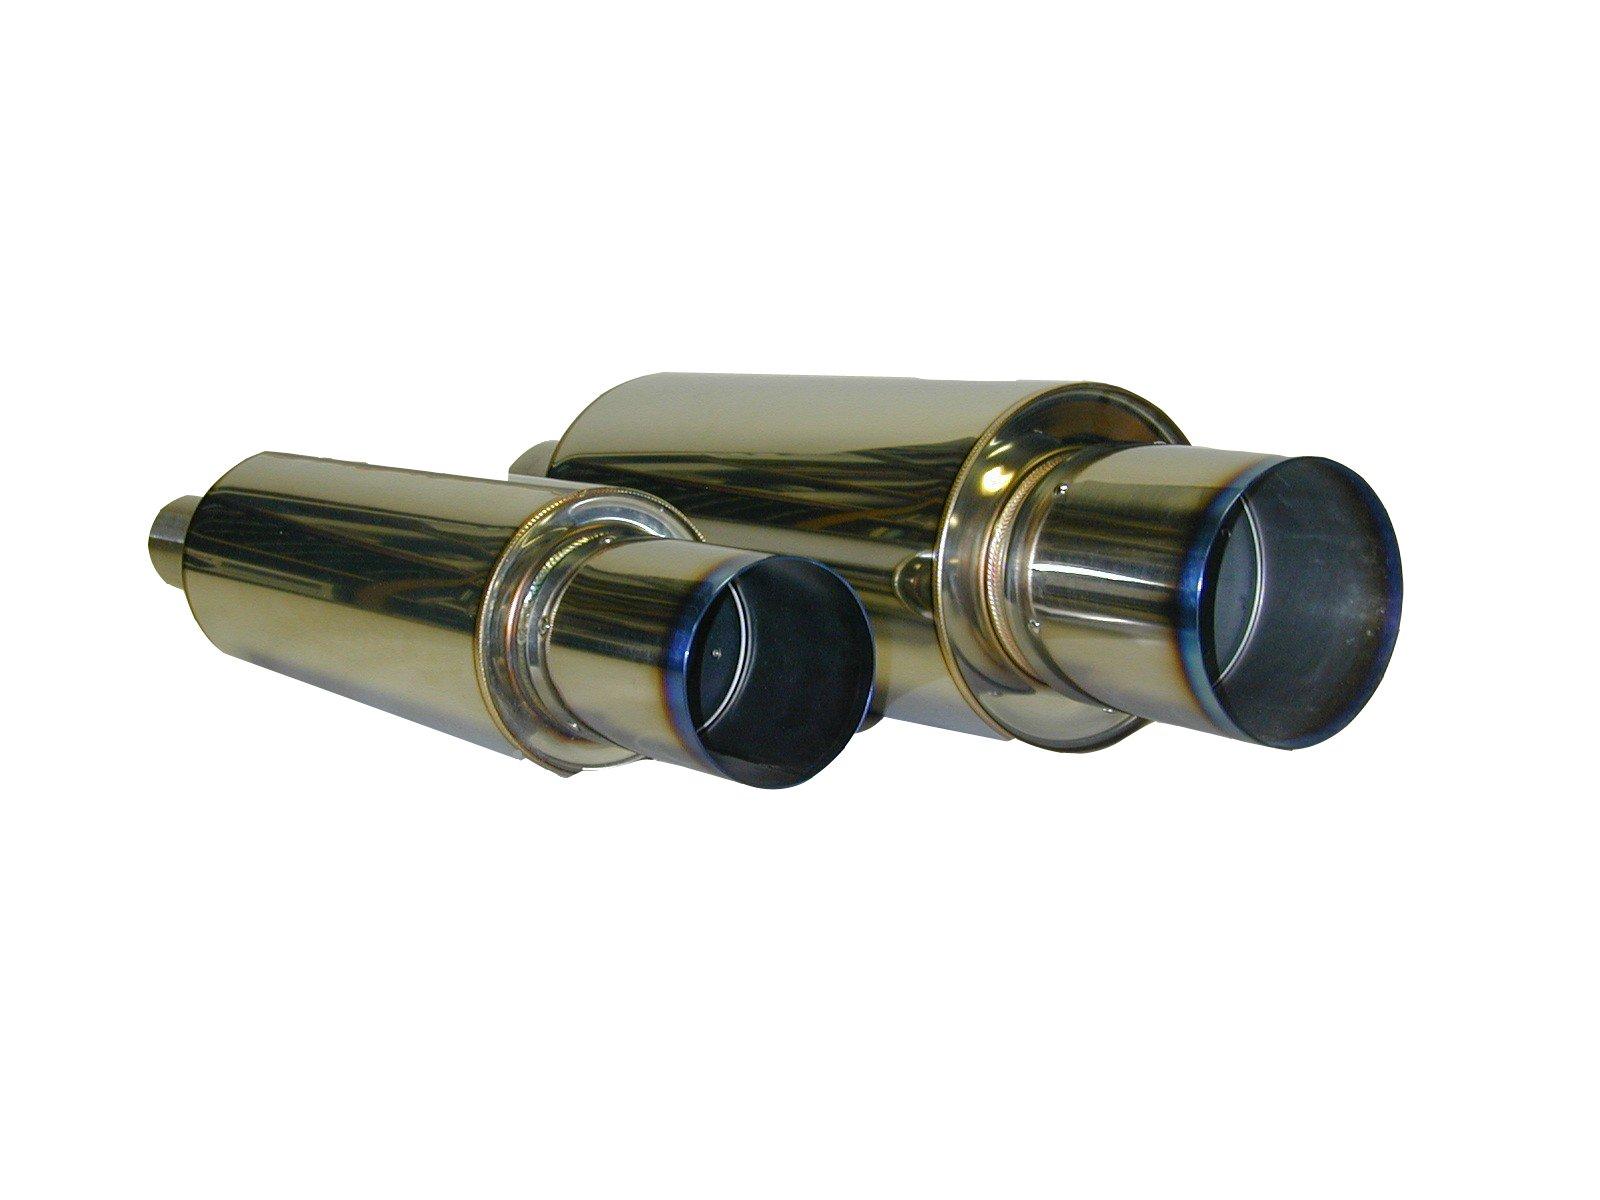 HKS 34005-FK001 Universal Stainless Hi-Power Ti Muffler by HKS (Image #1)